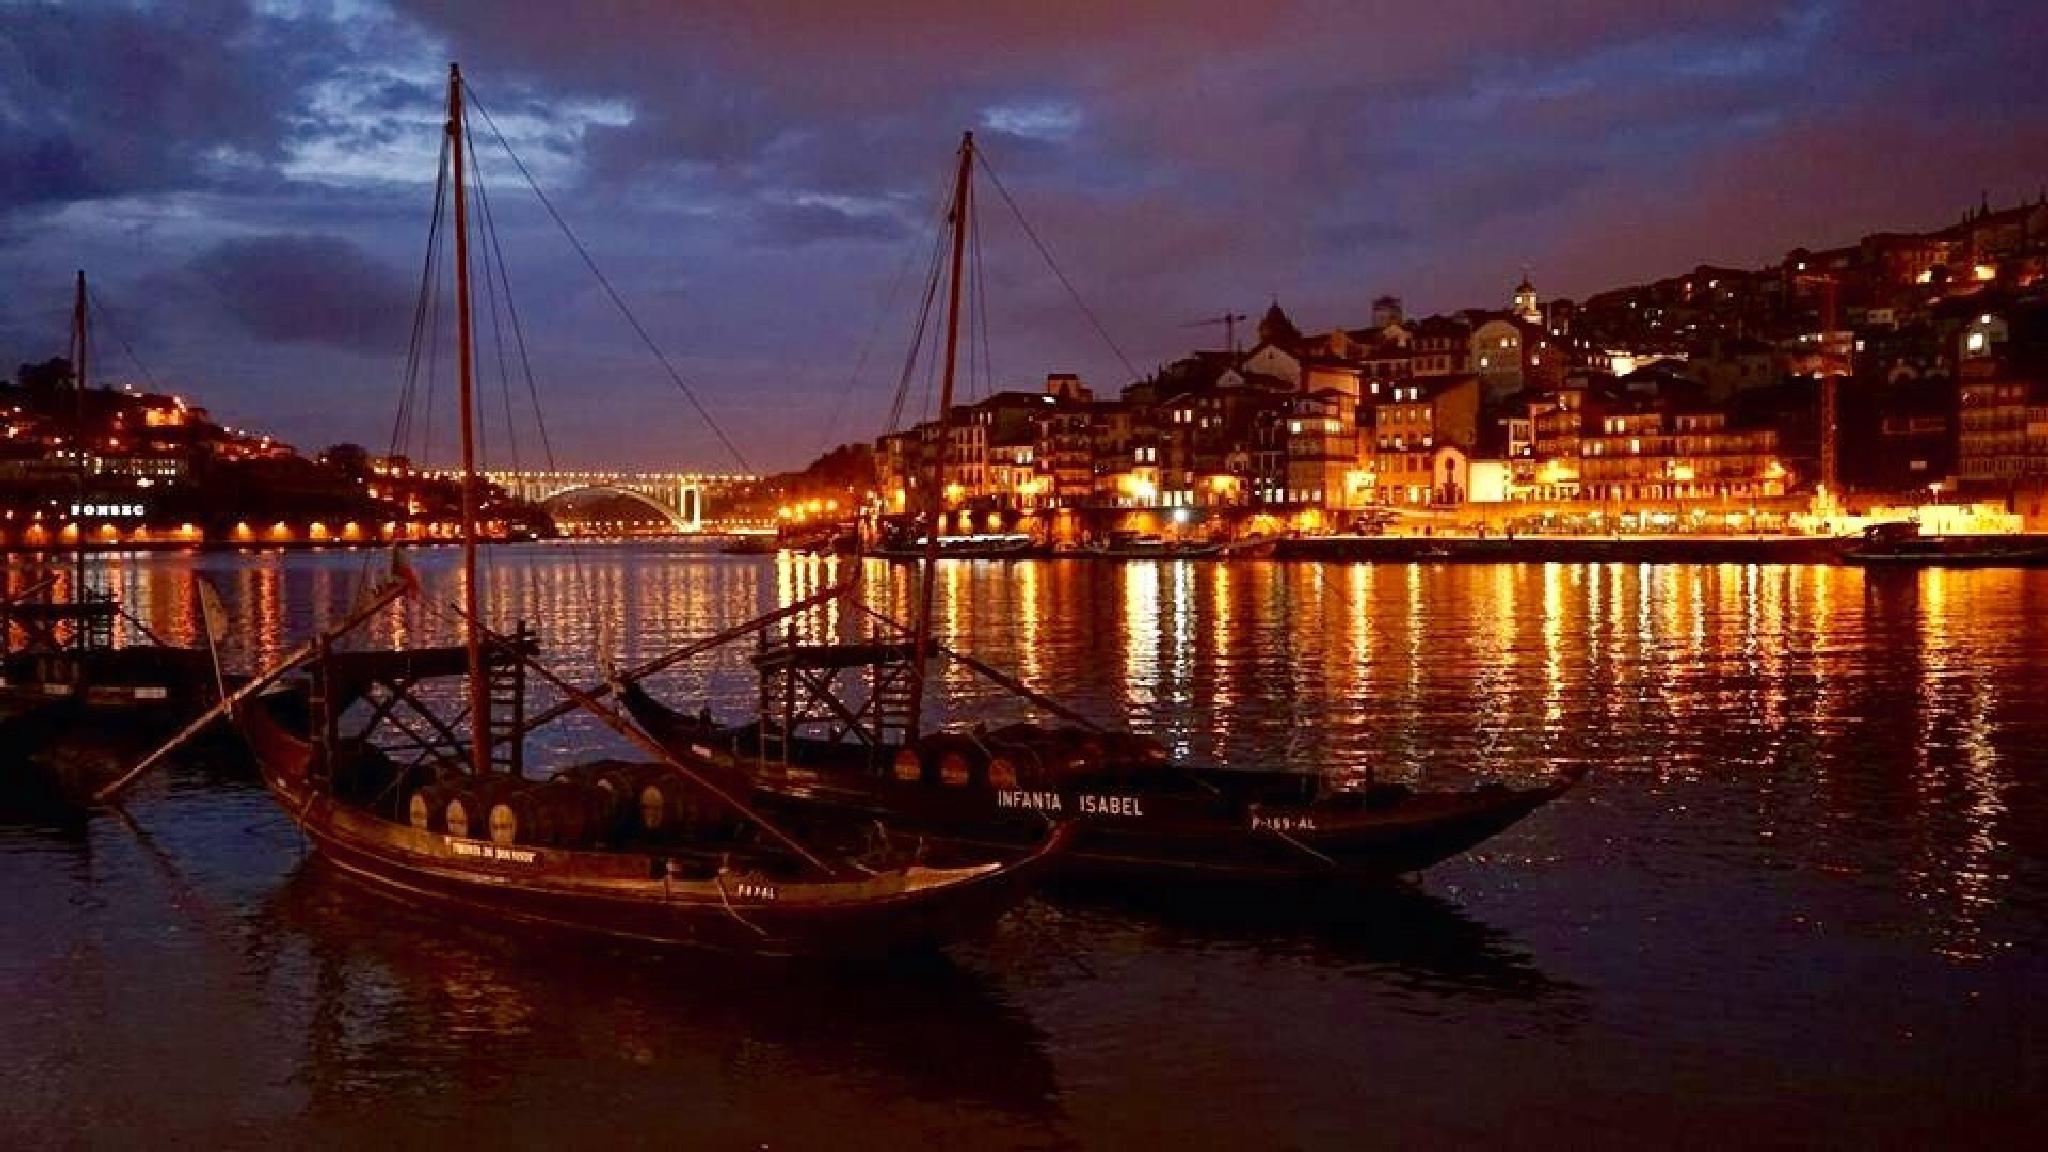 Dusk, Porto by philip.han